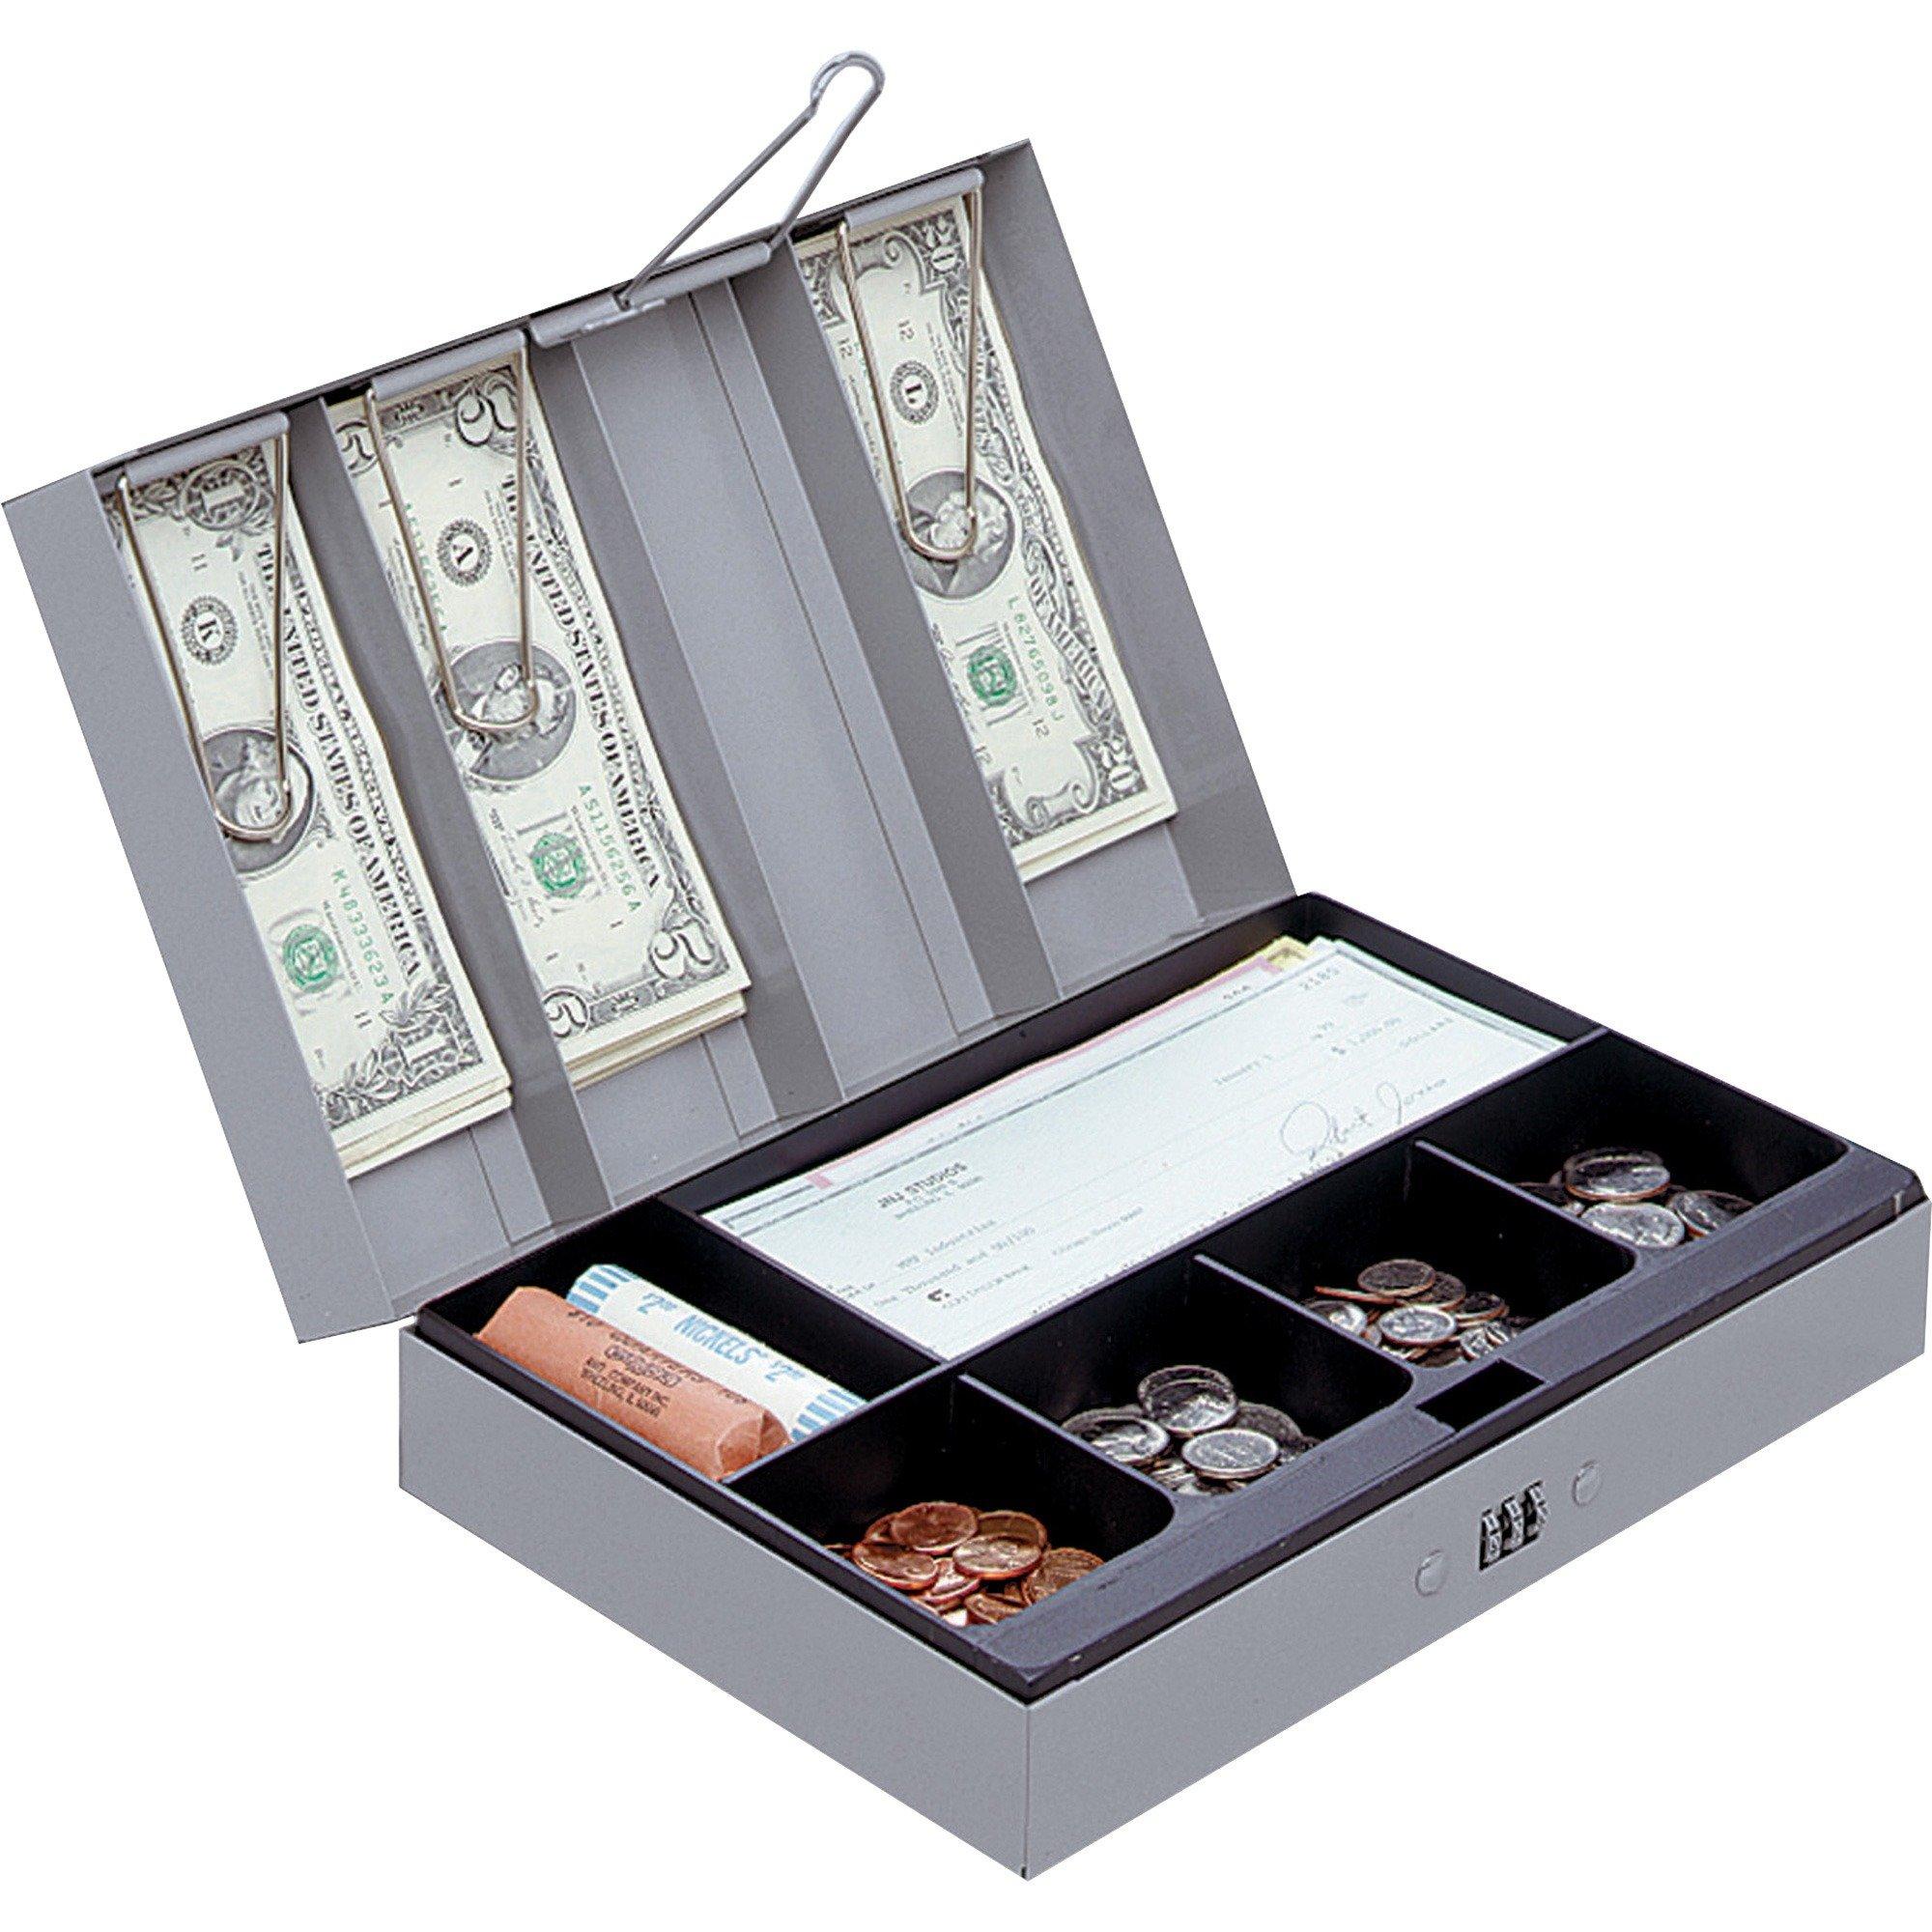 Sparco Combination Lock Cash Box, Steel, 11-1/2 x 7-3/4 x 3-1/4 Inches, Gray (SPR15508)